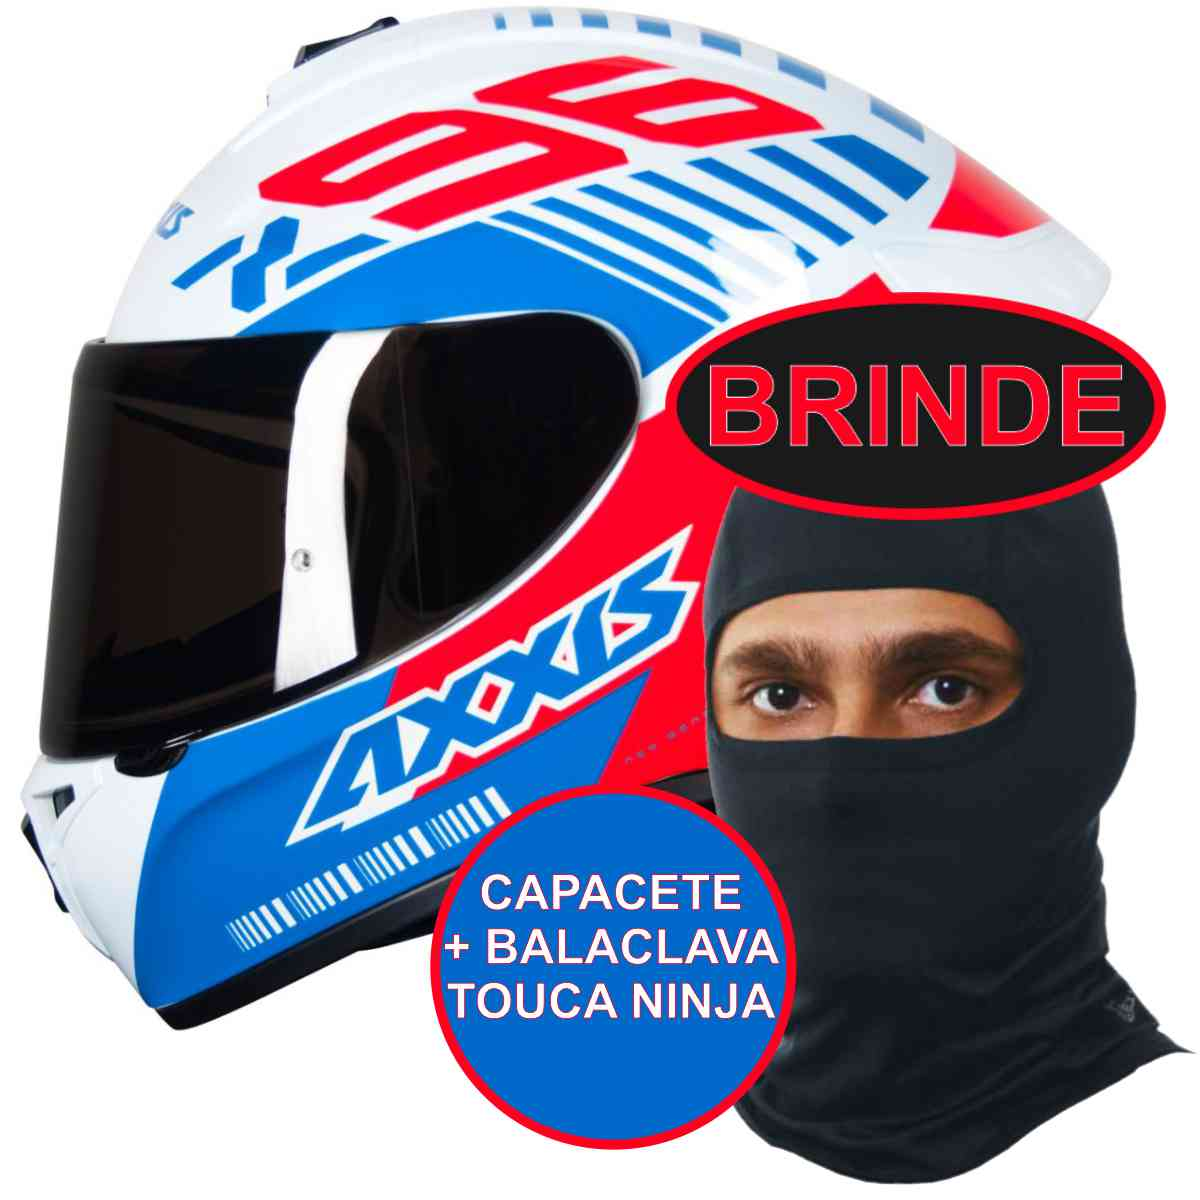 CAPACETE MOTO AXXIS DRAKEN Z96 BRANCO VERMELHO E AZUL BRILHANTE Nº 64 + BALACLAVA TOUCA NINJA